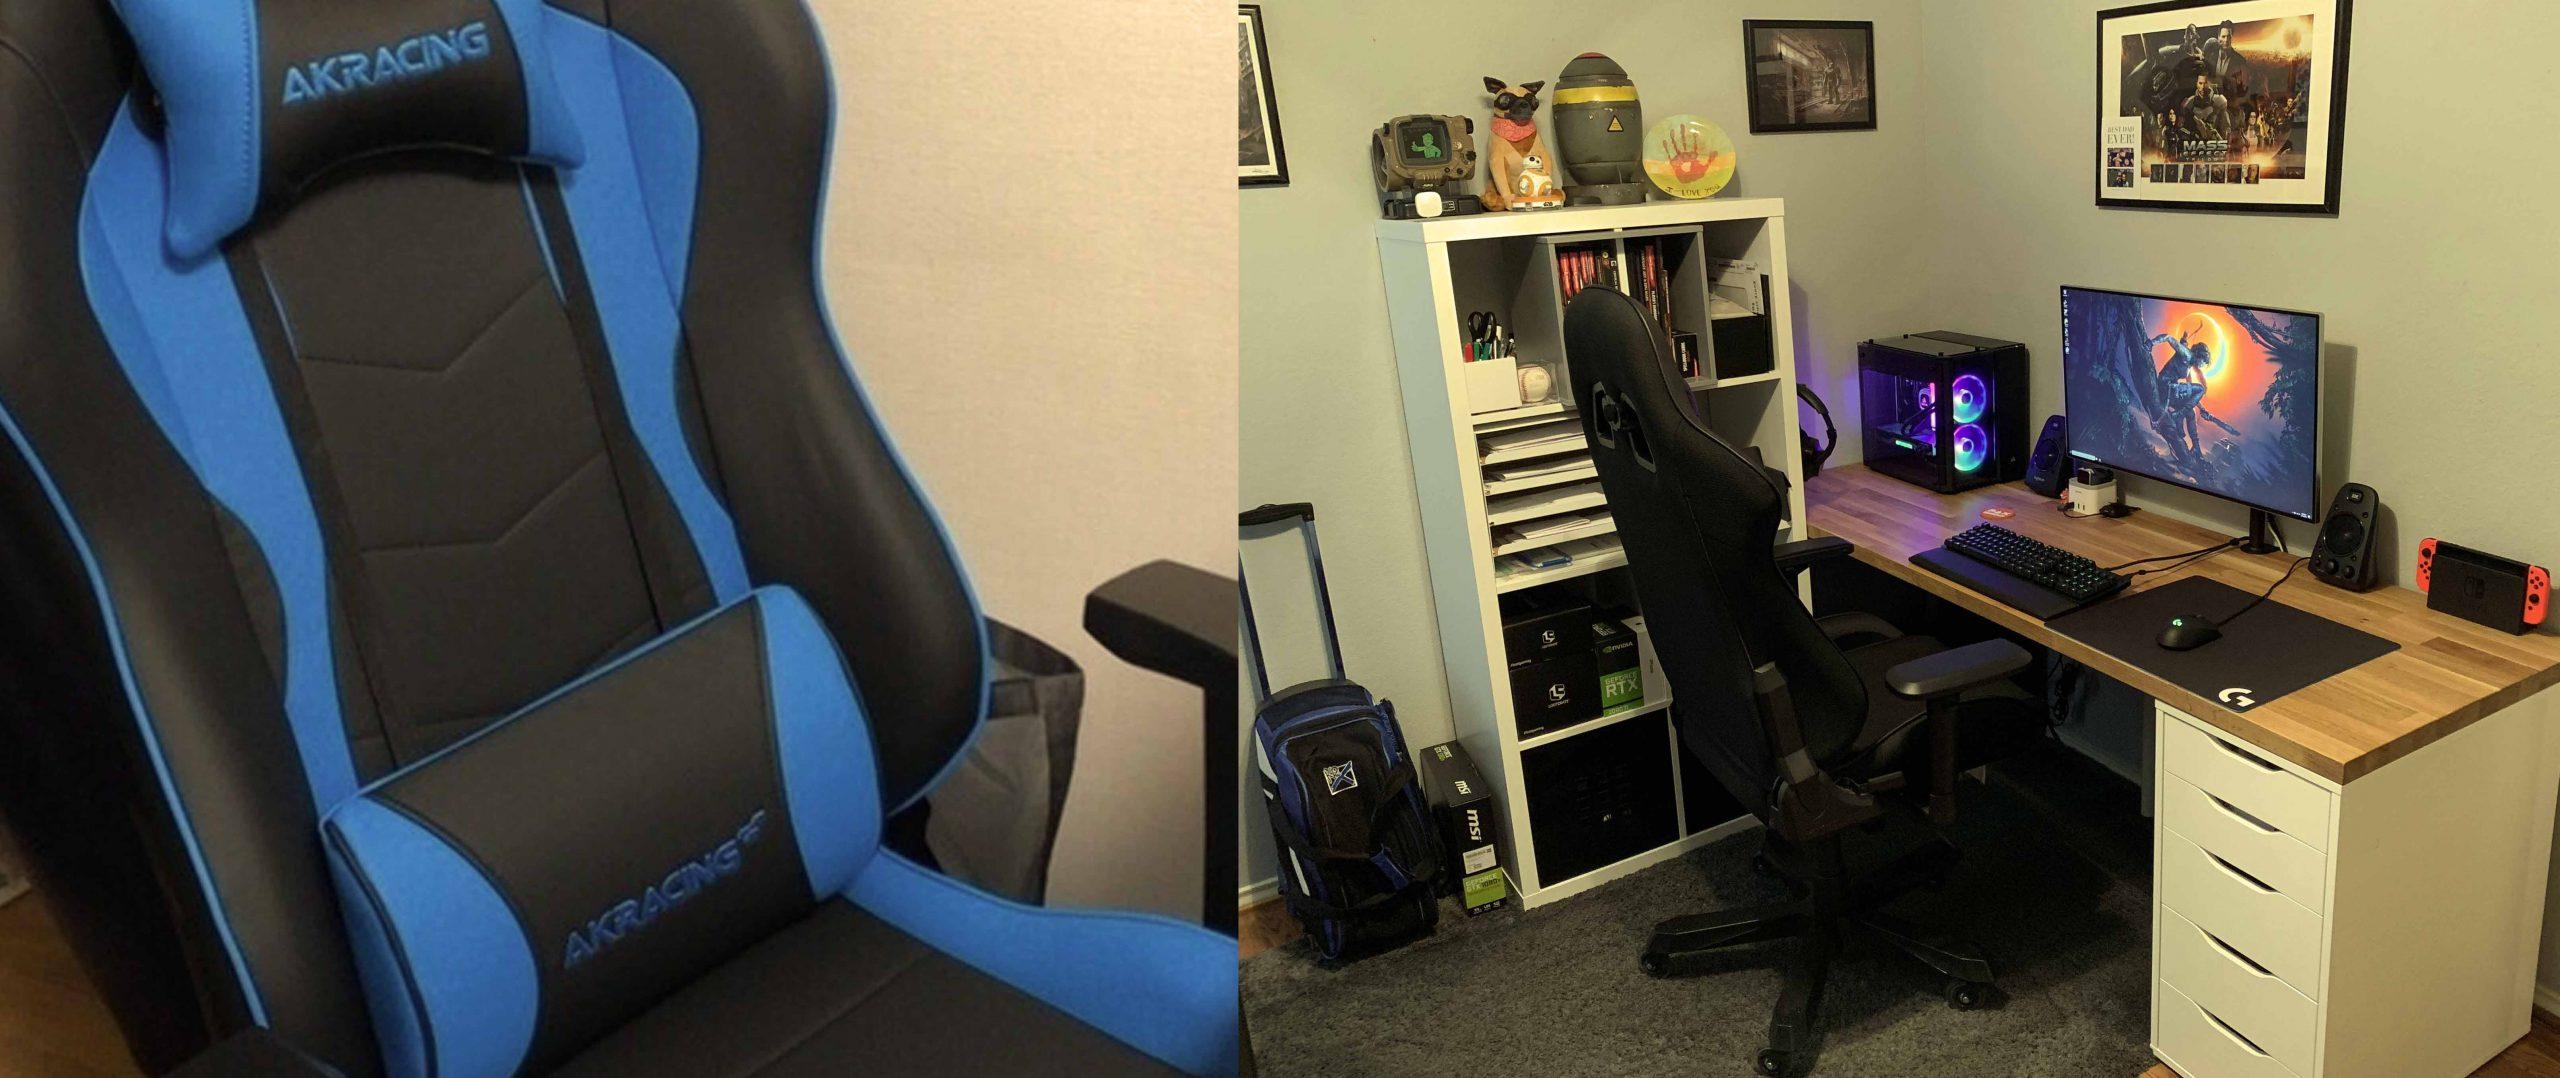 gaming chairs  - صندلی های بازی - gaming chairs - gaming chair - تاریخچه-و-کاربرد-صندلی-های-گیمینگ-صندلی-گیمینگ-صندلی-بازی-akracing